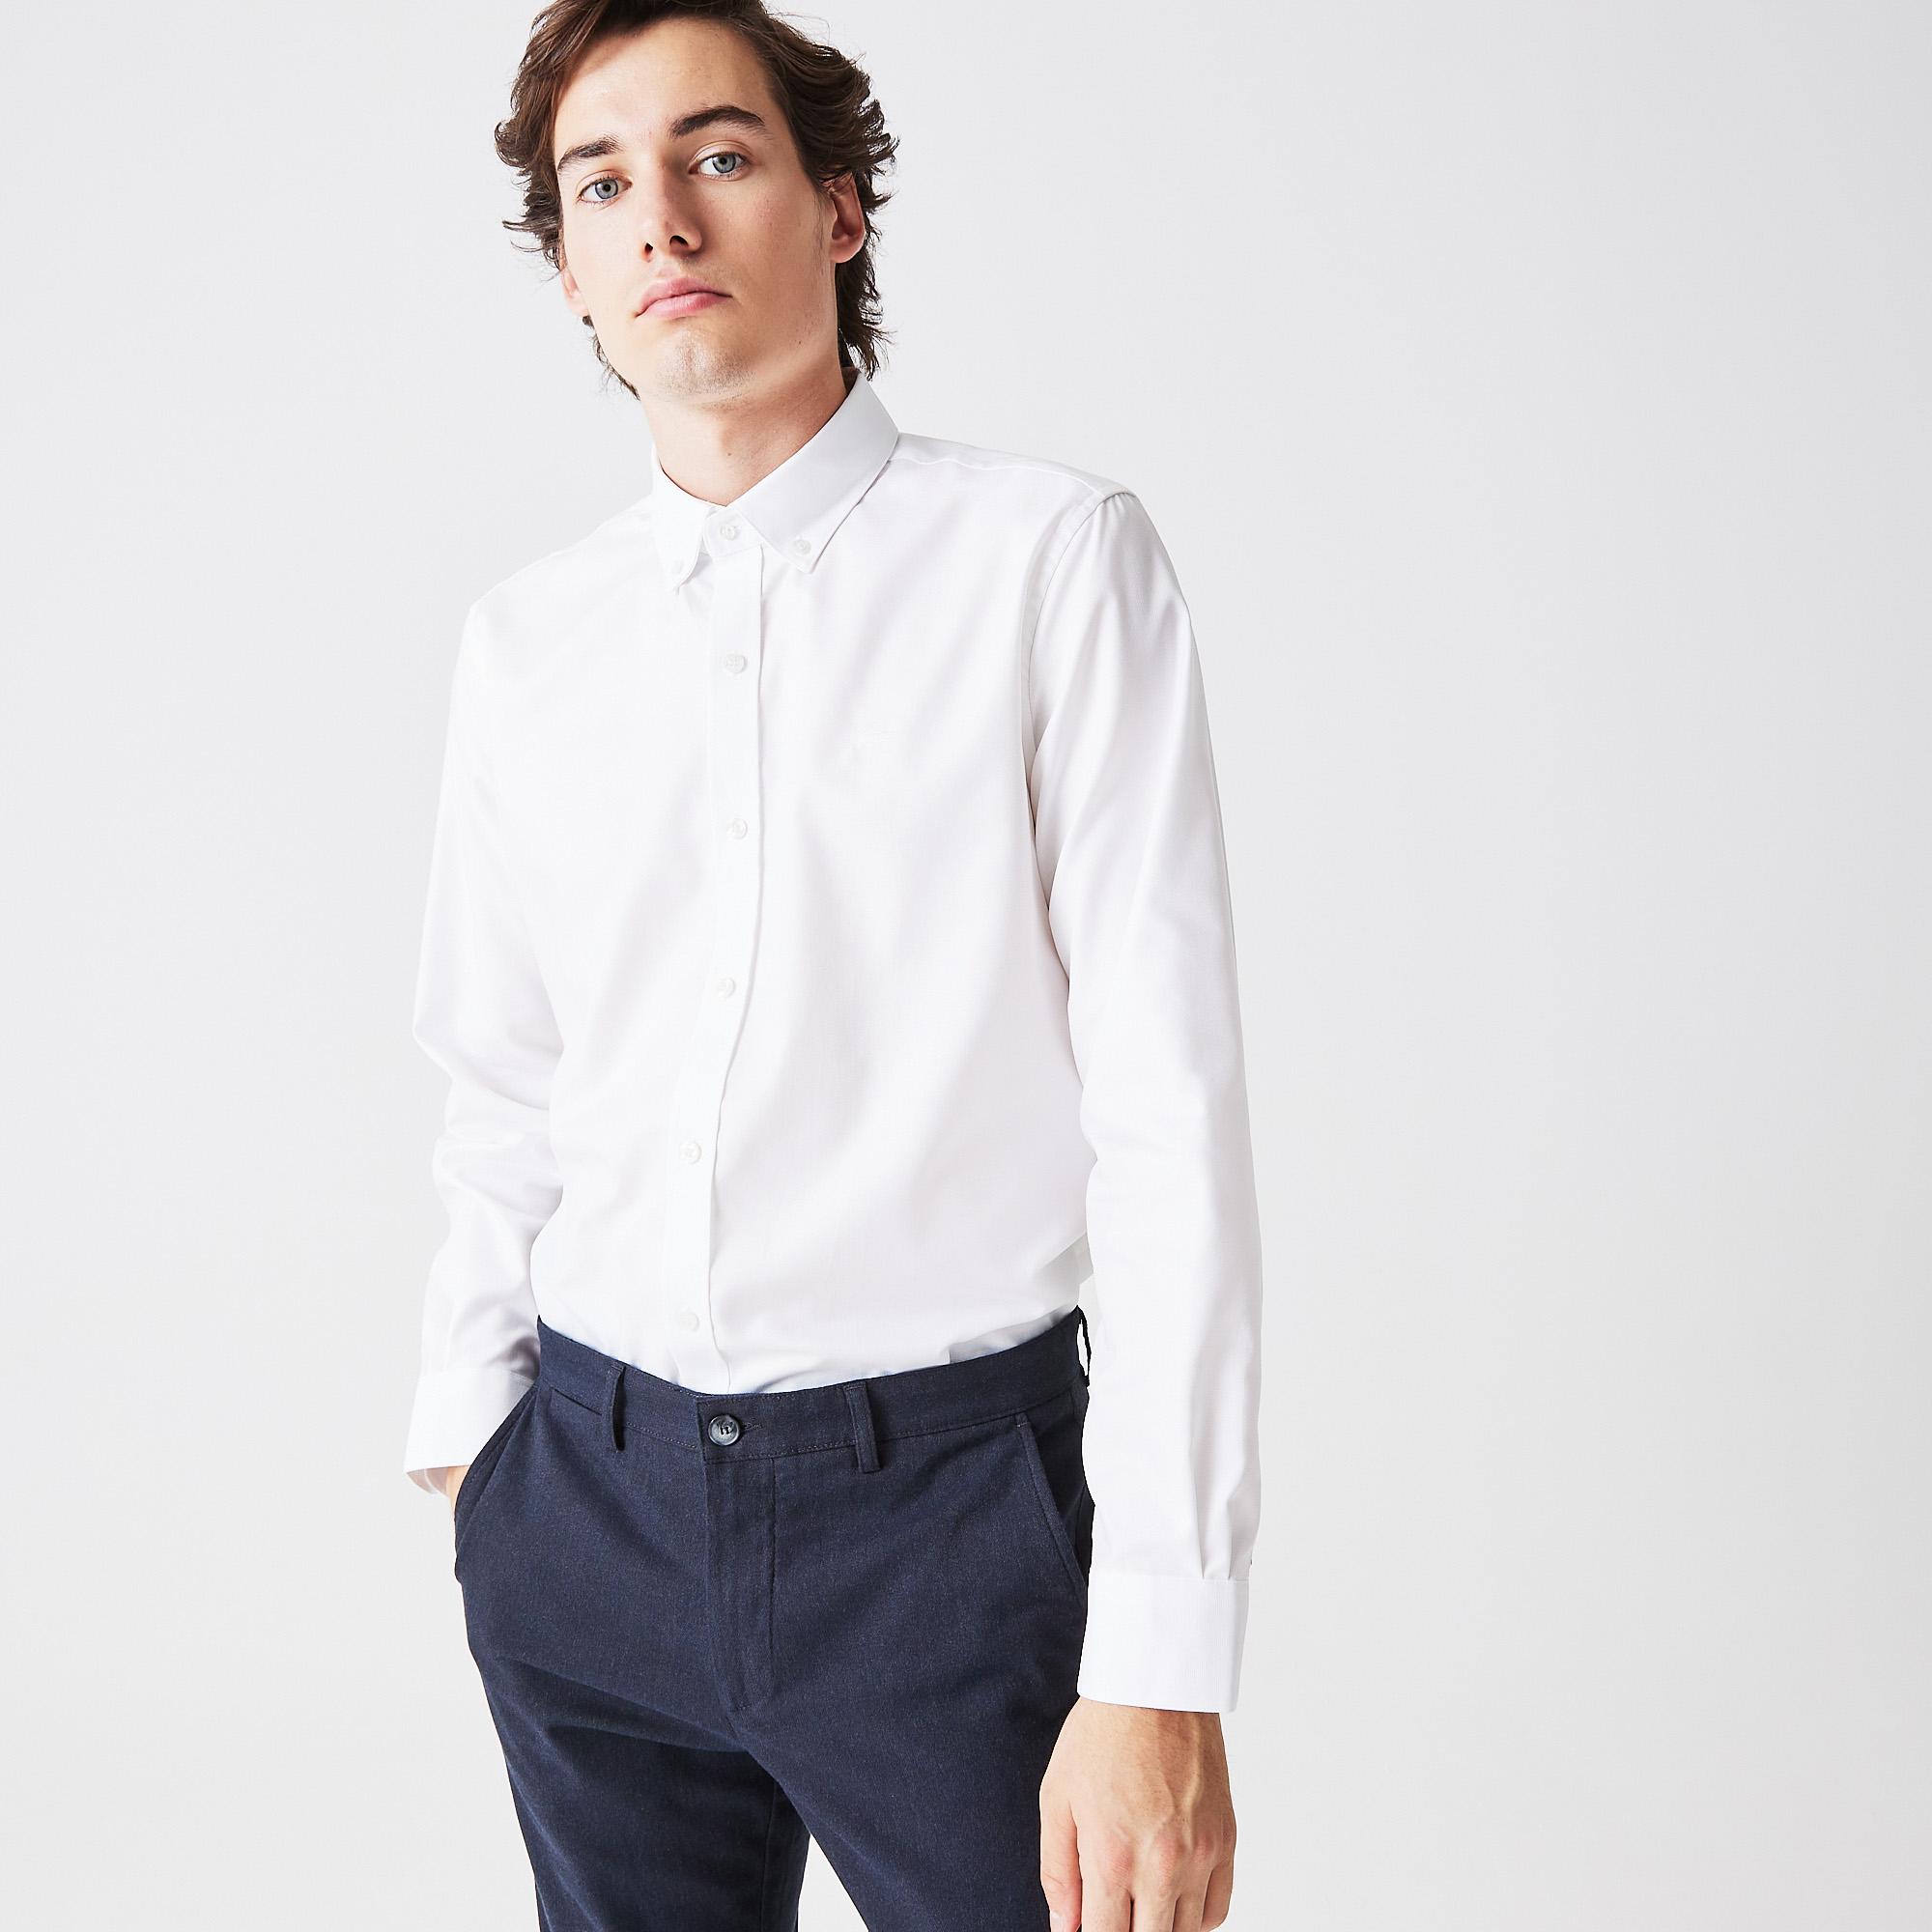 Рубашка Lacoste CH9623800 от Lacoste